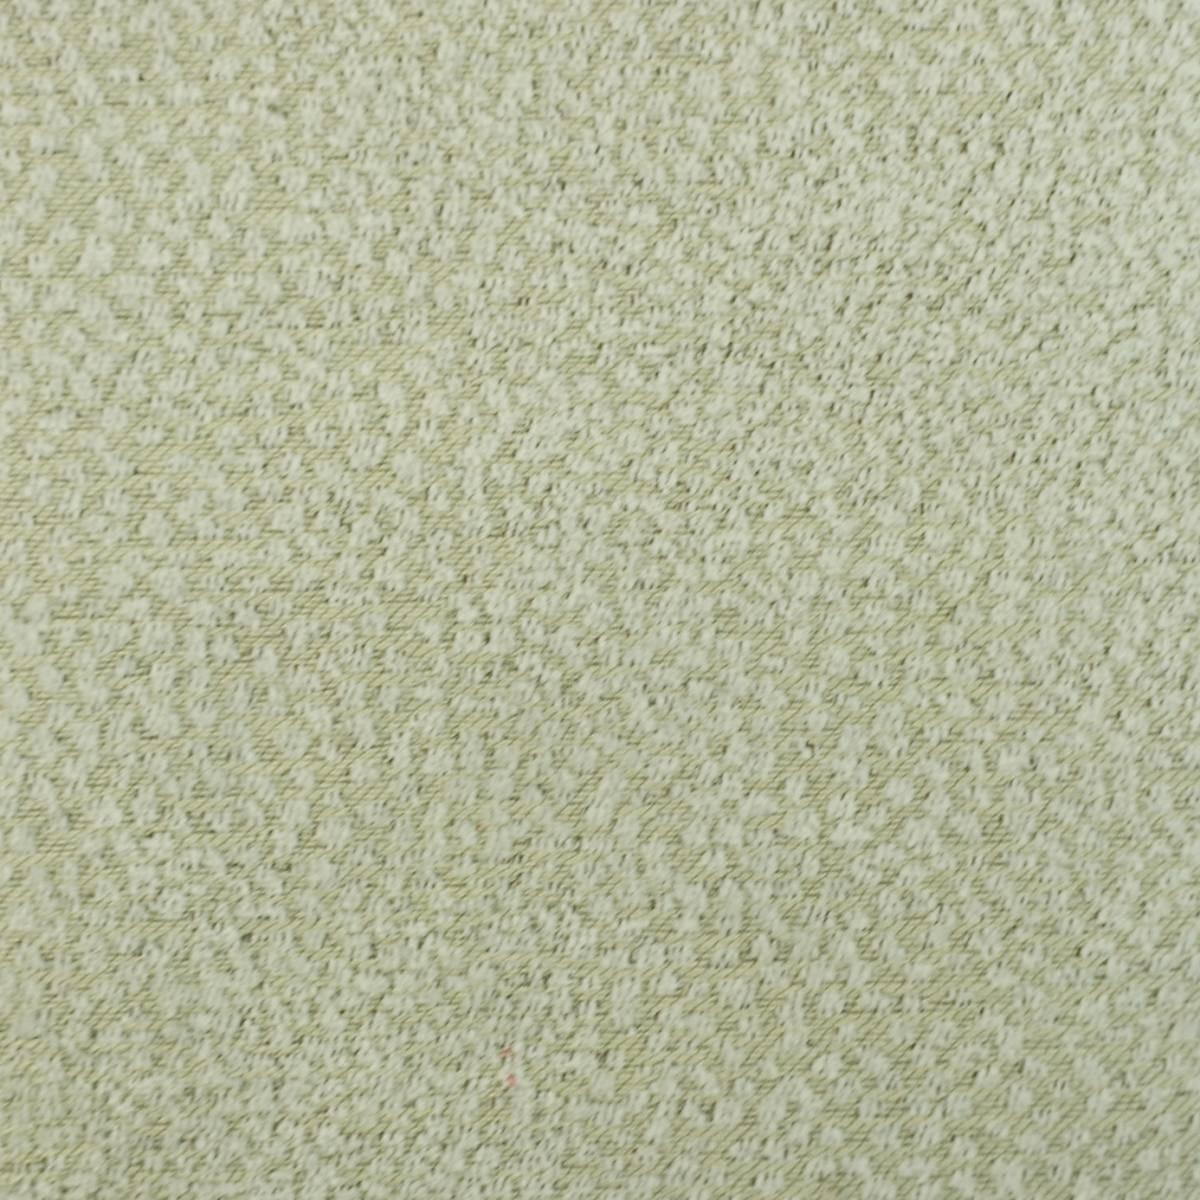 Pippa Fabric 017 Pippa017 Blendworth Fabrics Pippa Fabrics Collection